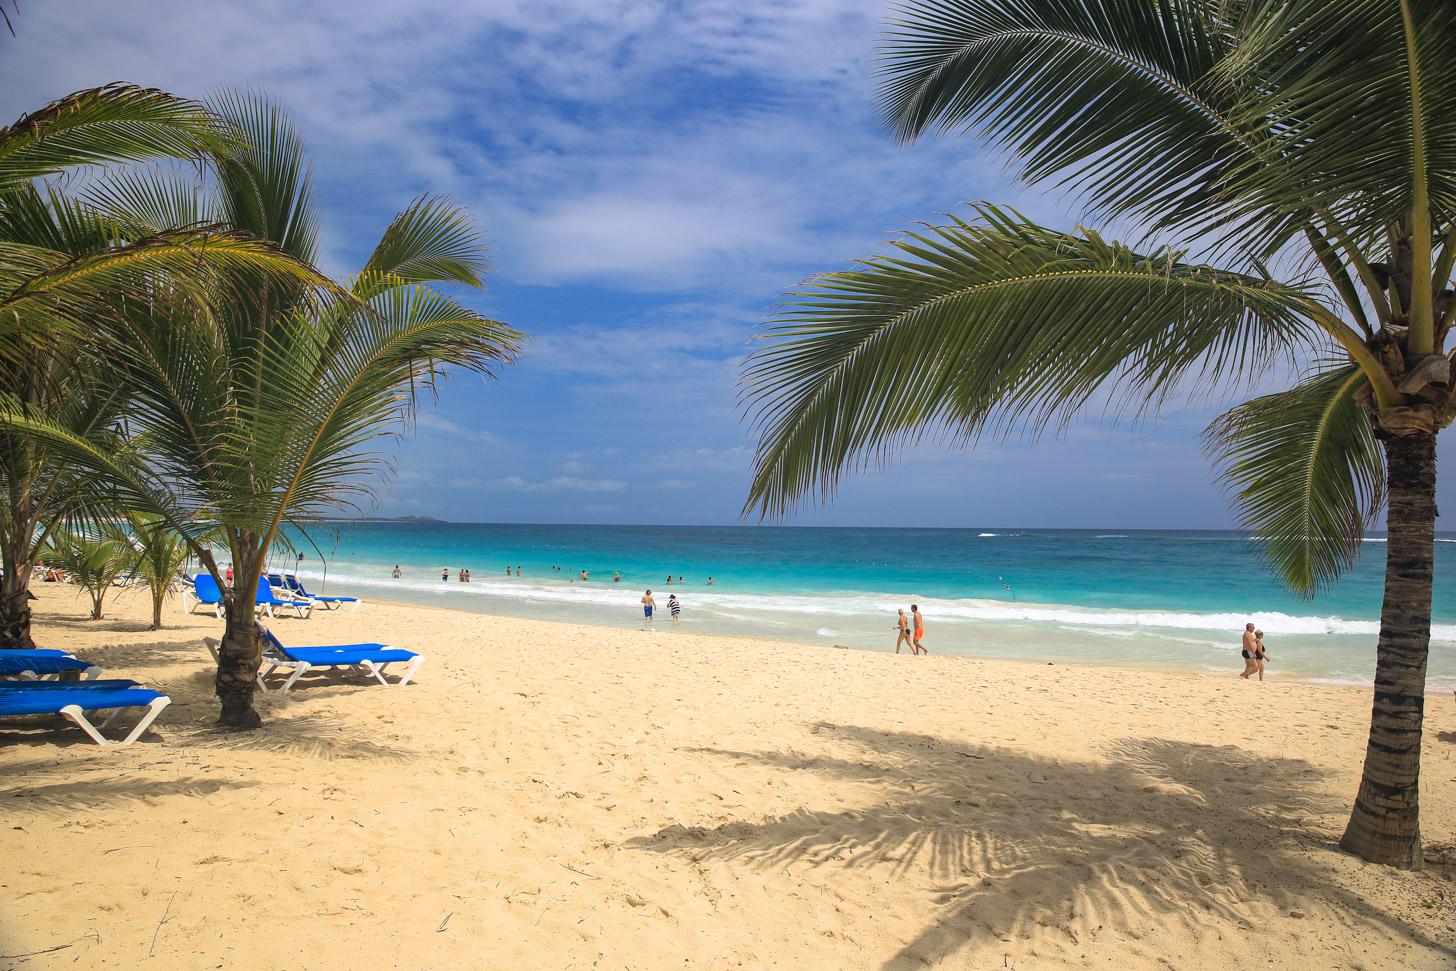 De stranden van Punta Cana